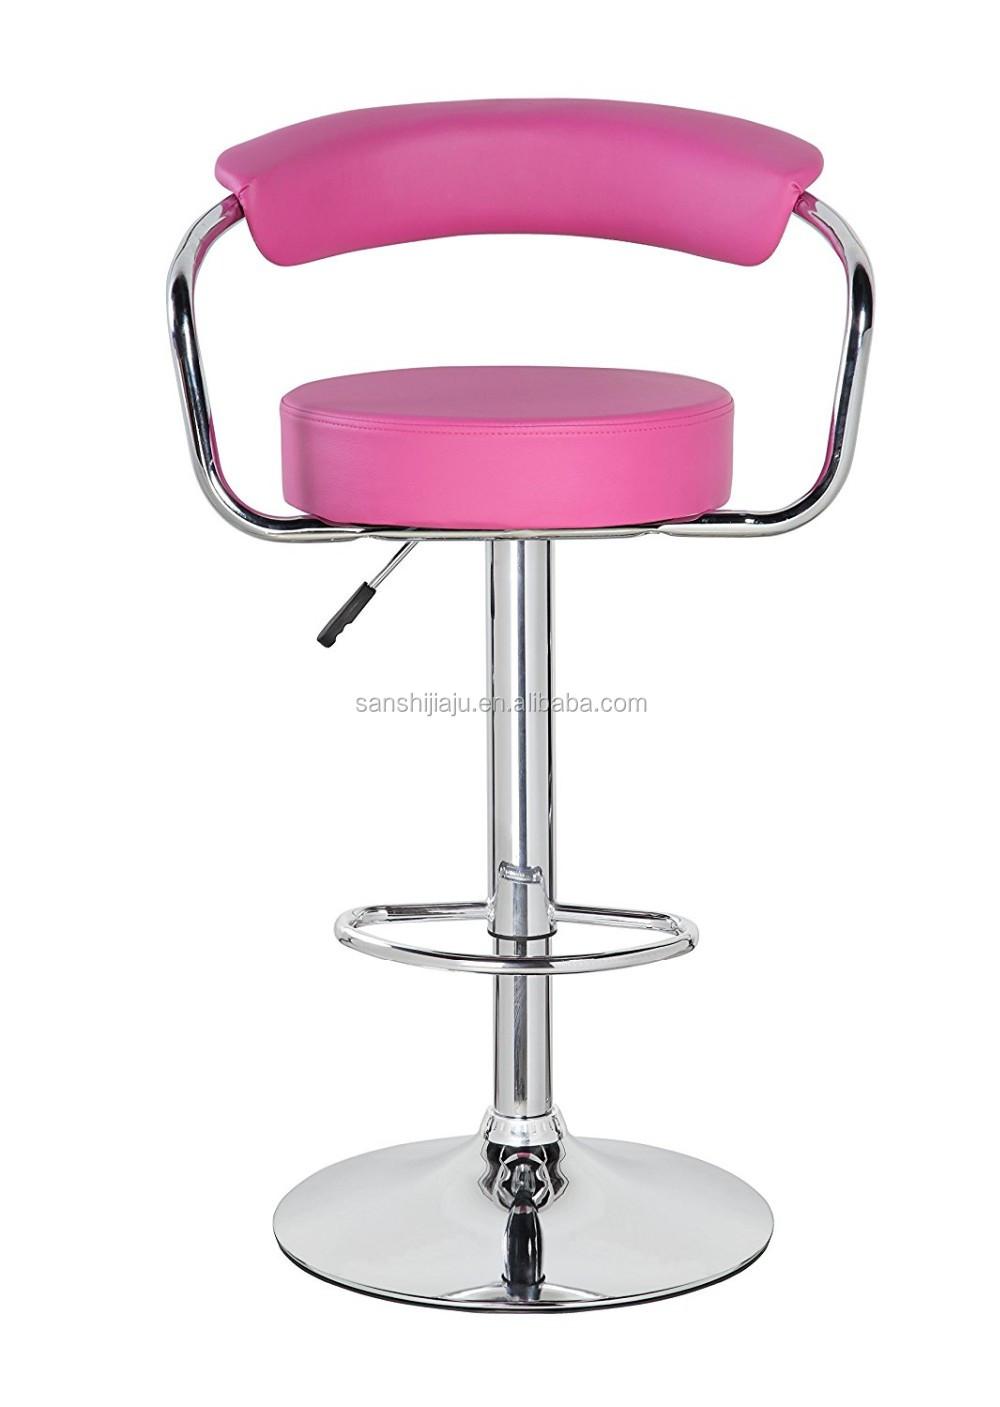 high quality big lots bar stools for sale used buy high quality big lots bar stools sale used. Black Bedroom Furniture Sets. Home Design Ideas